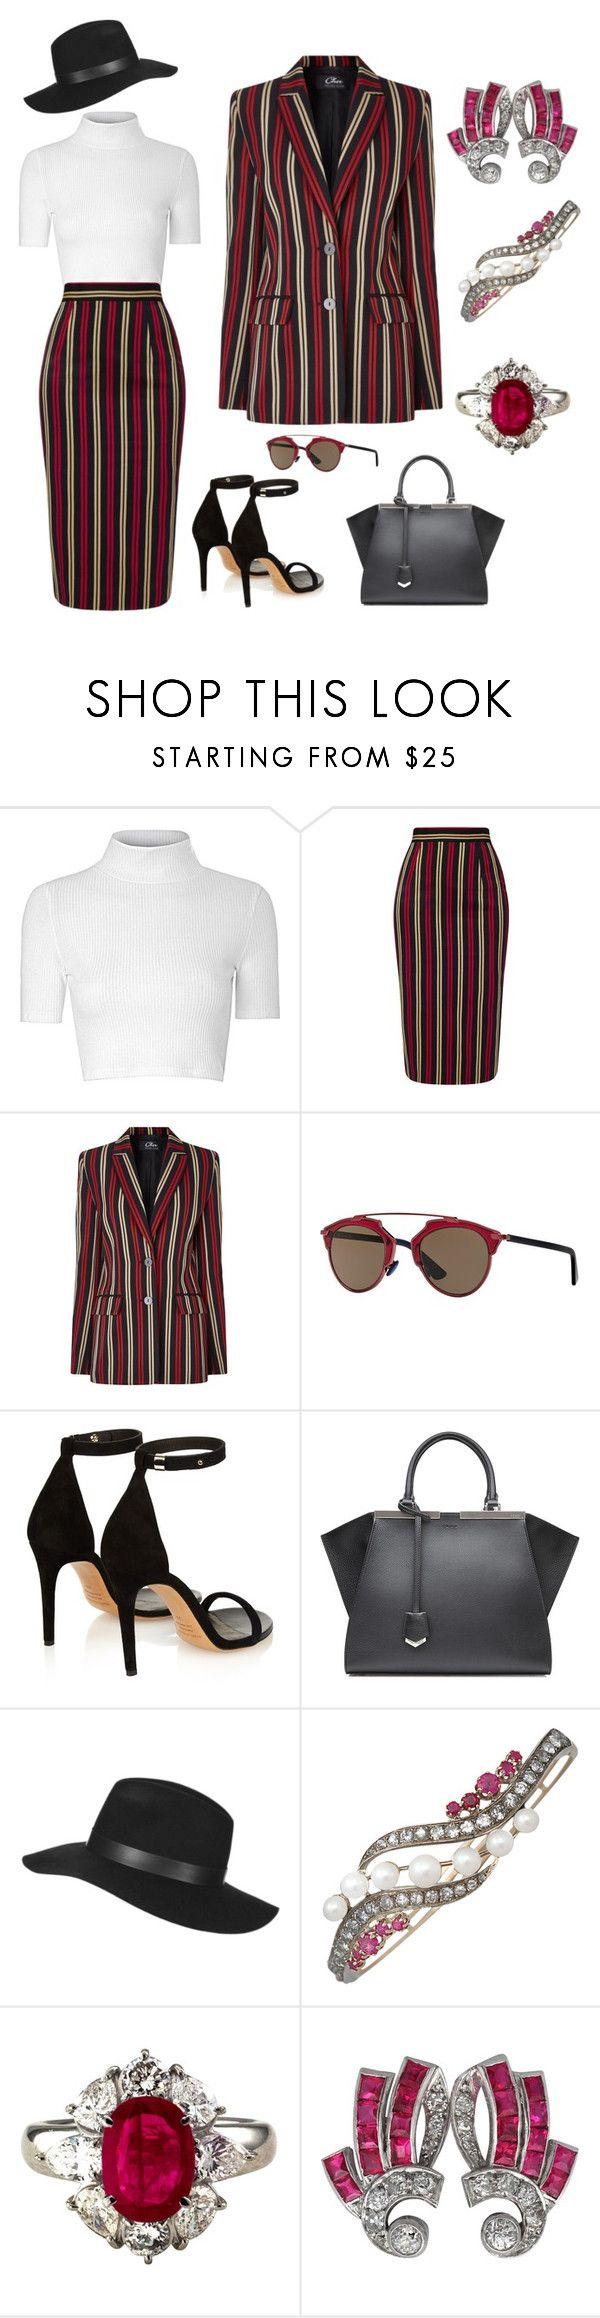 """Vintage Gangsta"" by karen-galves on Polyvore featuring Glamorous, MICHEL KLEIN, Christian Dior, Isabel Marant, Fendi, Topshop and vintage"